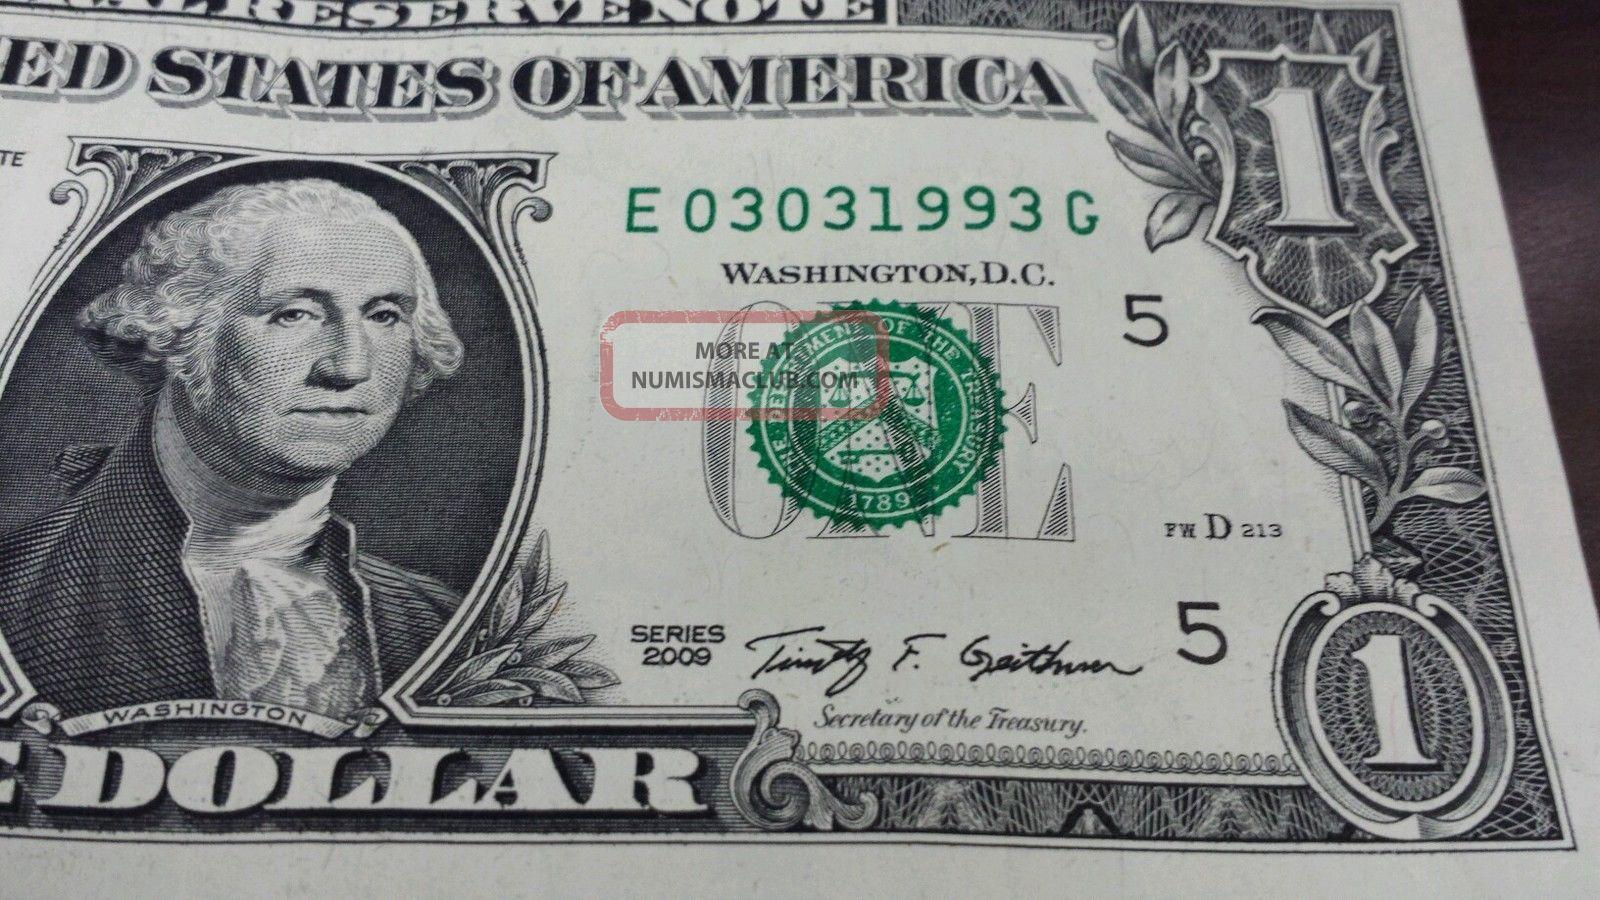 3 - 3 - 1993 Birthday Date 1 One Dollar Bill Series 2009